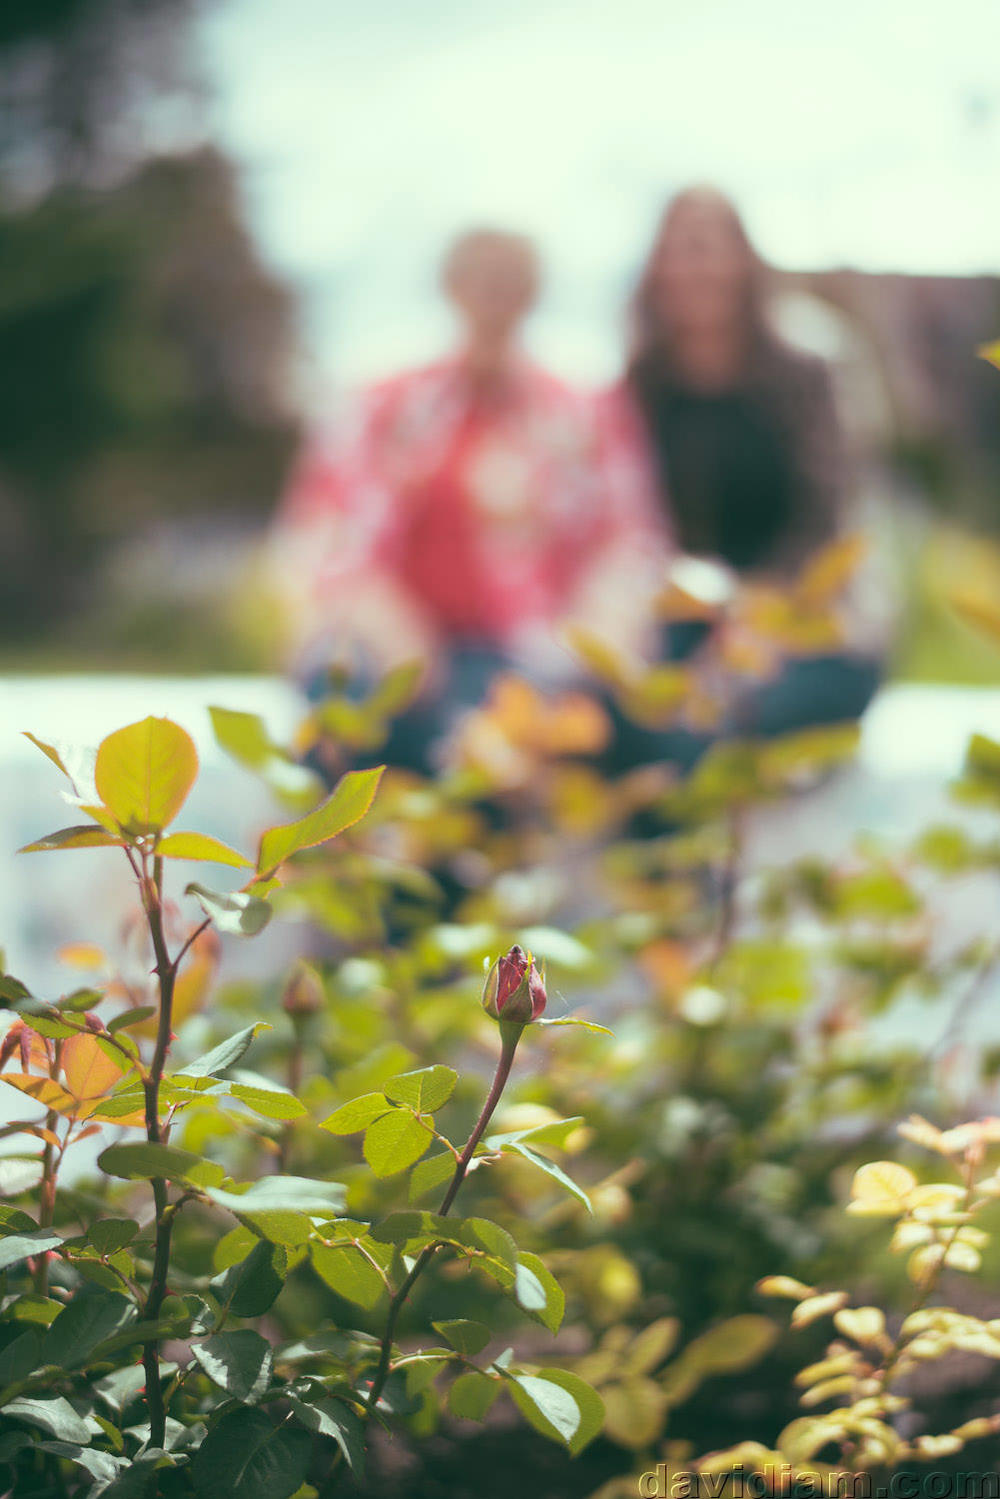 Stratford-Lifestyle-Photography-Photographer-020.jpg